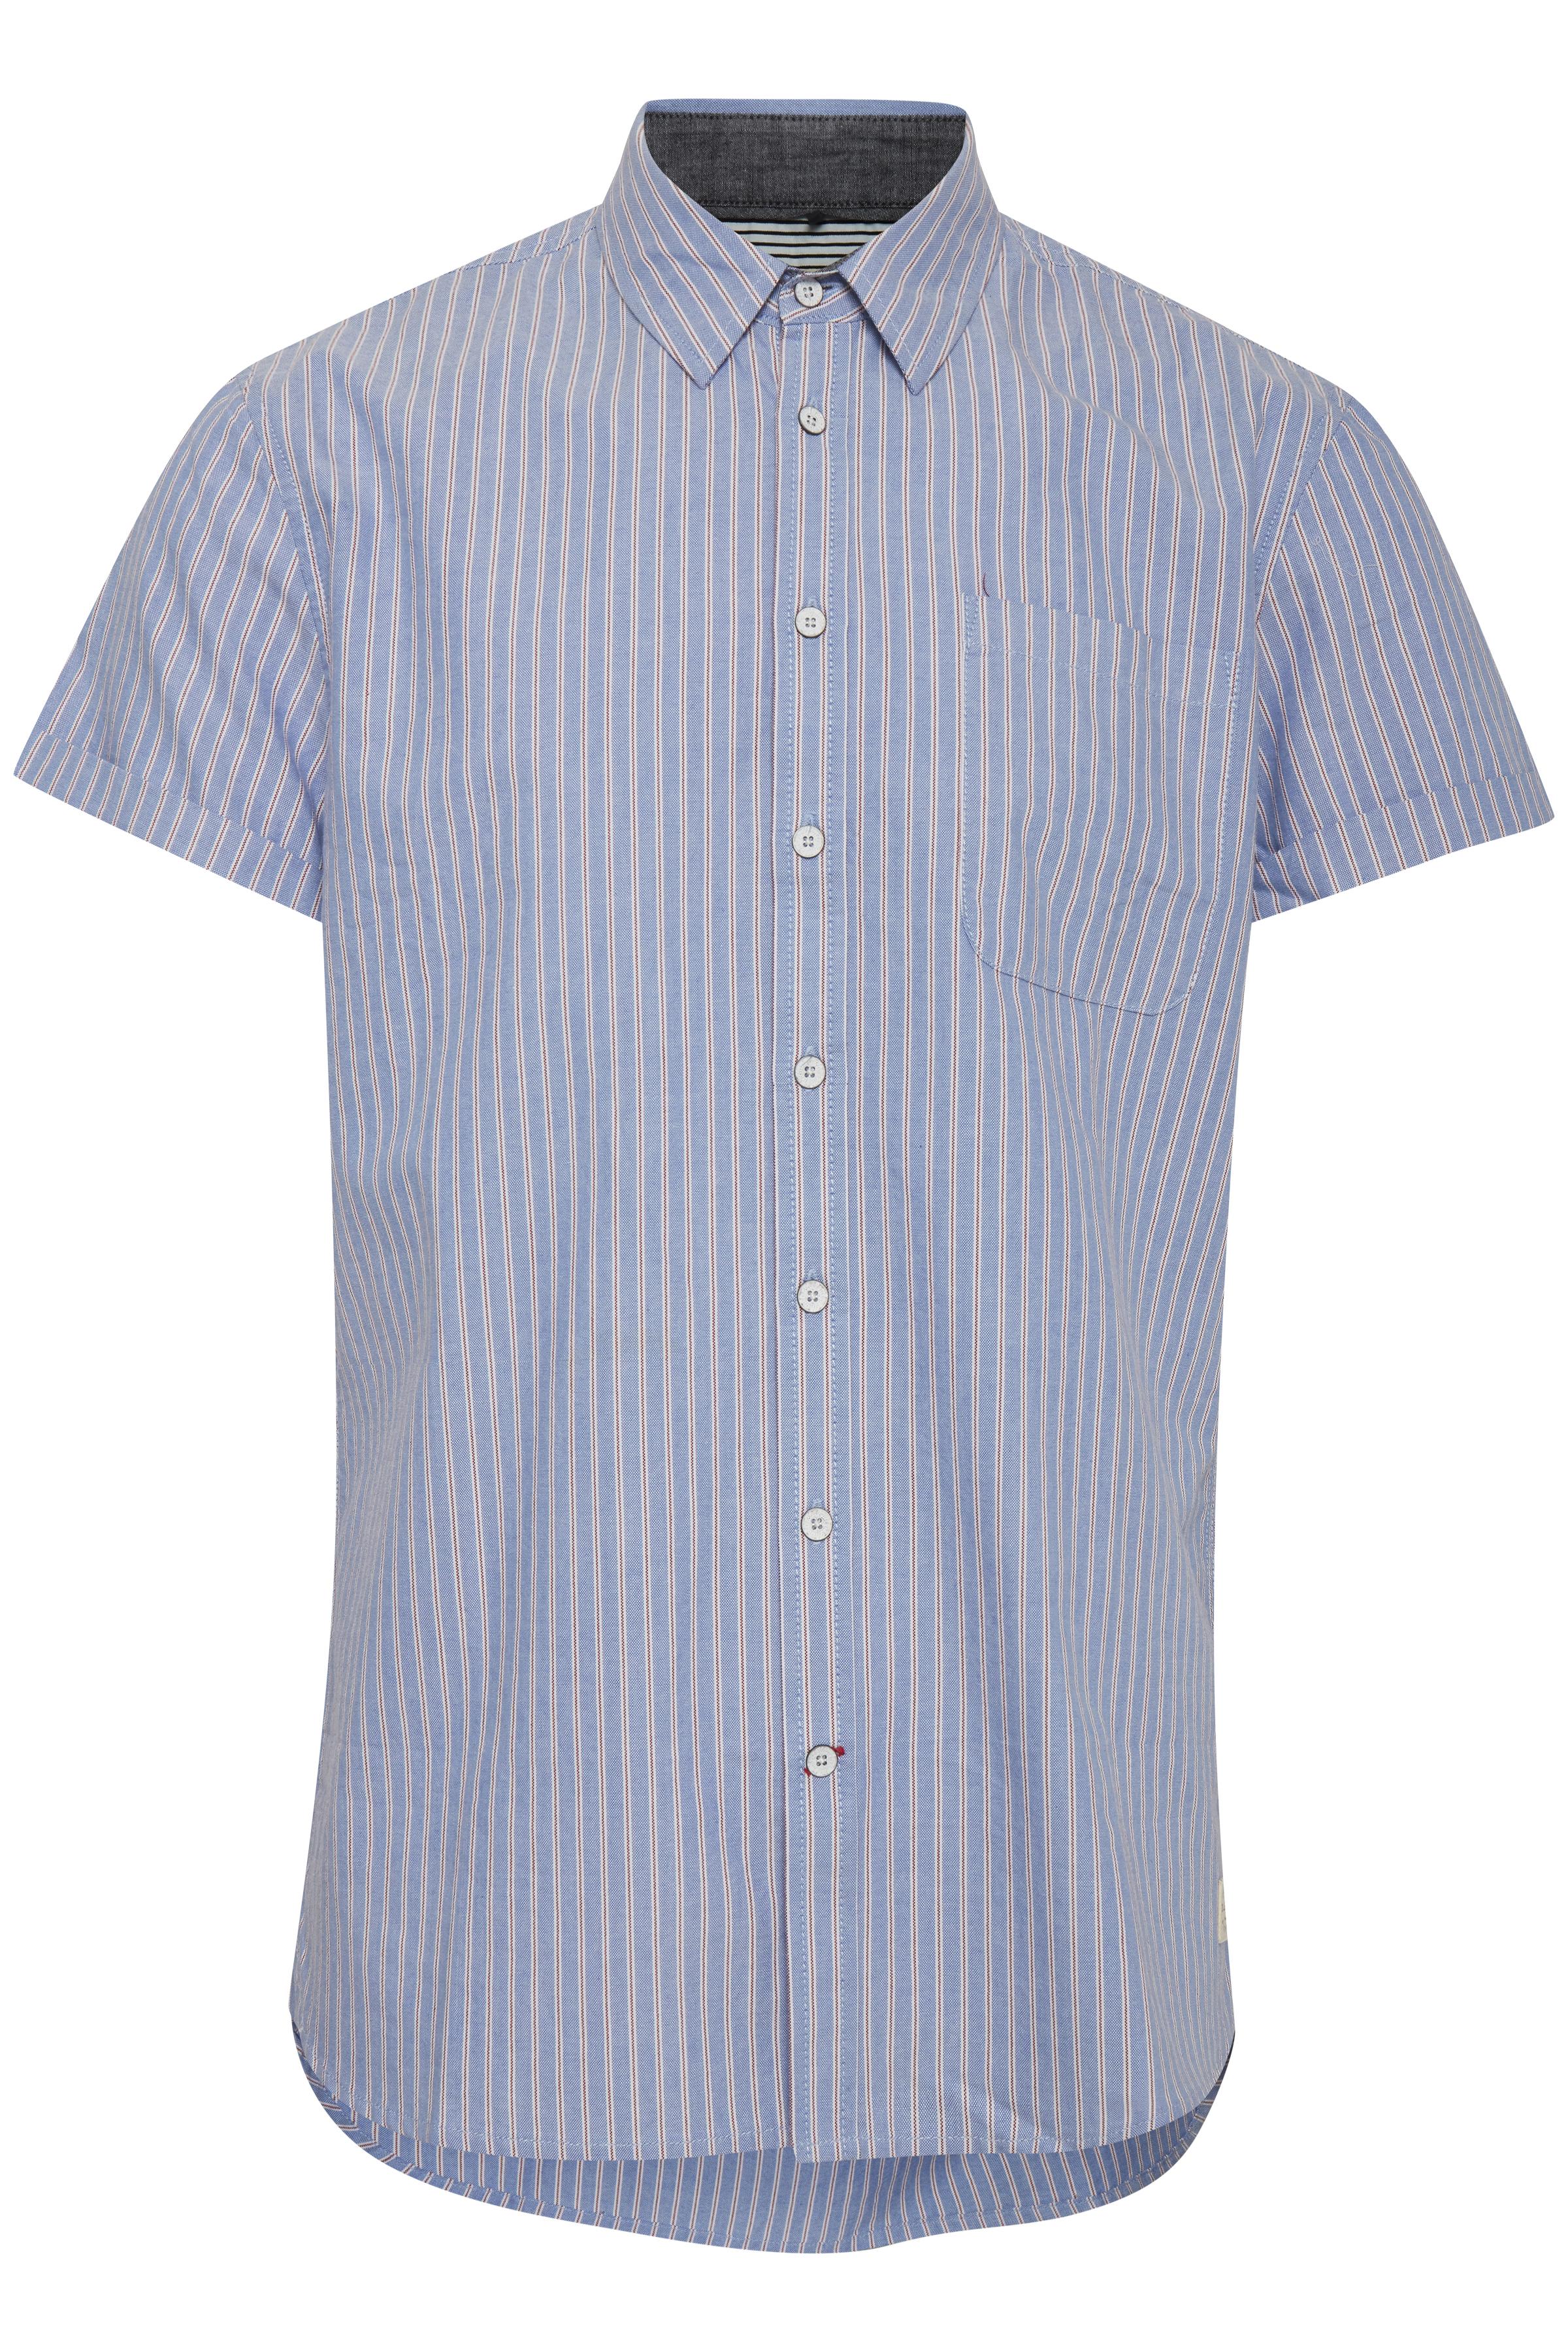 Image of   Blend He Herre Kortærmet skjorte - Denim Blue